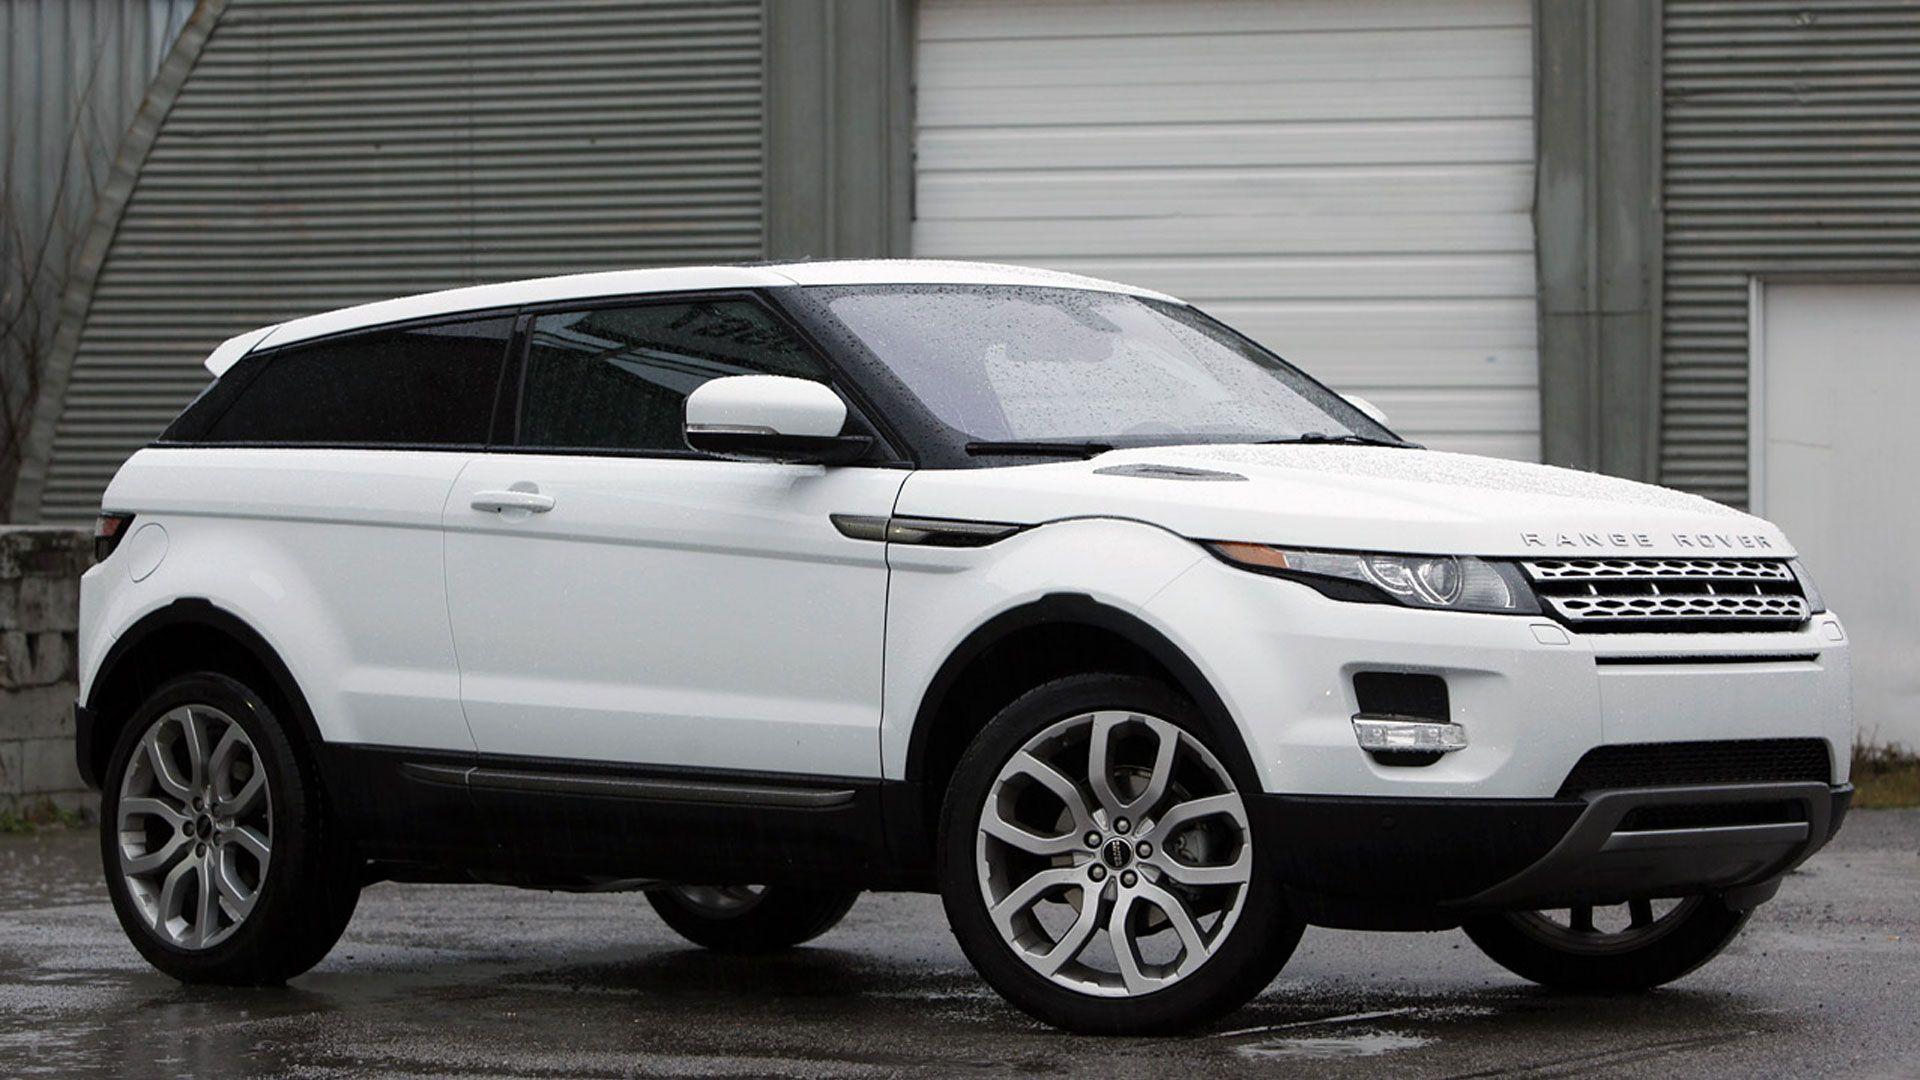 2014 Range Rover HD s Wallpaper HD Car Wallpaper